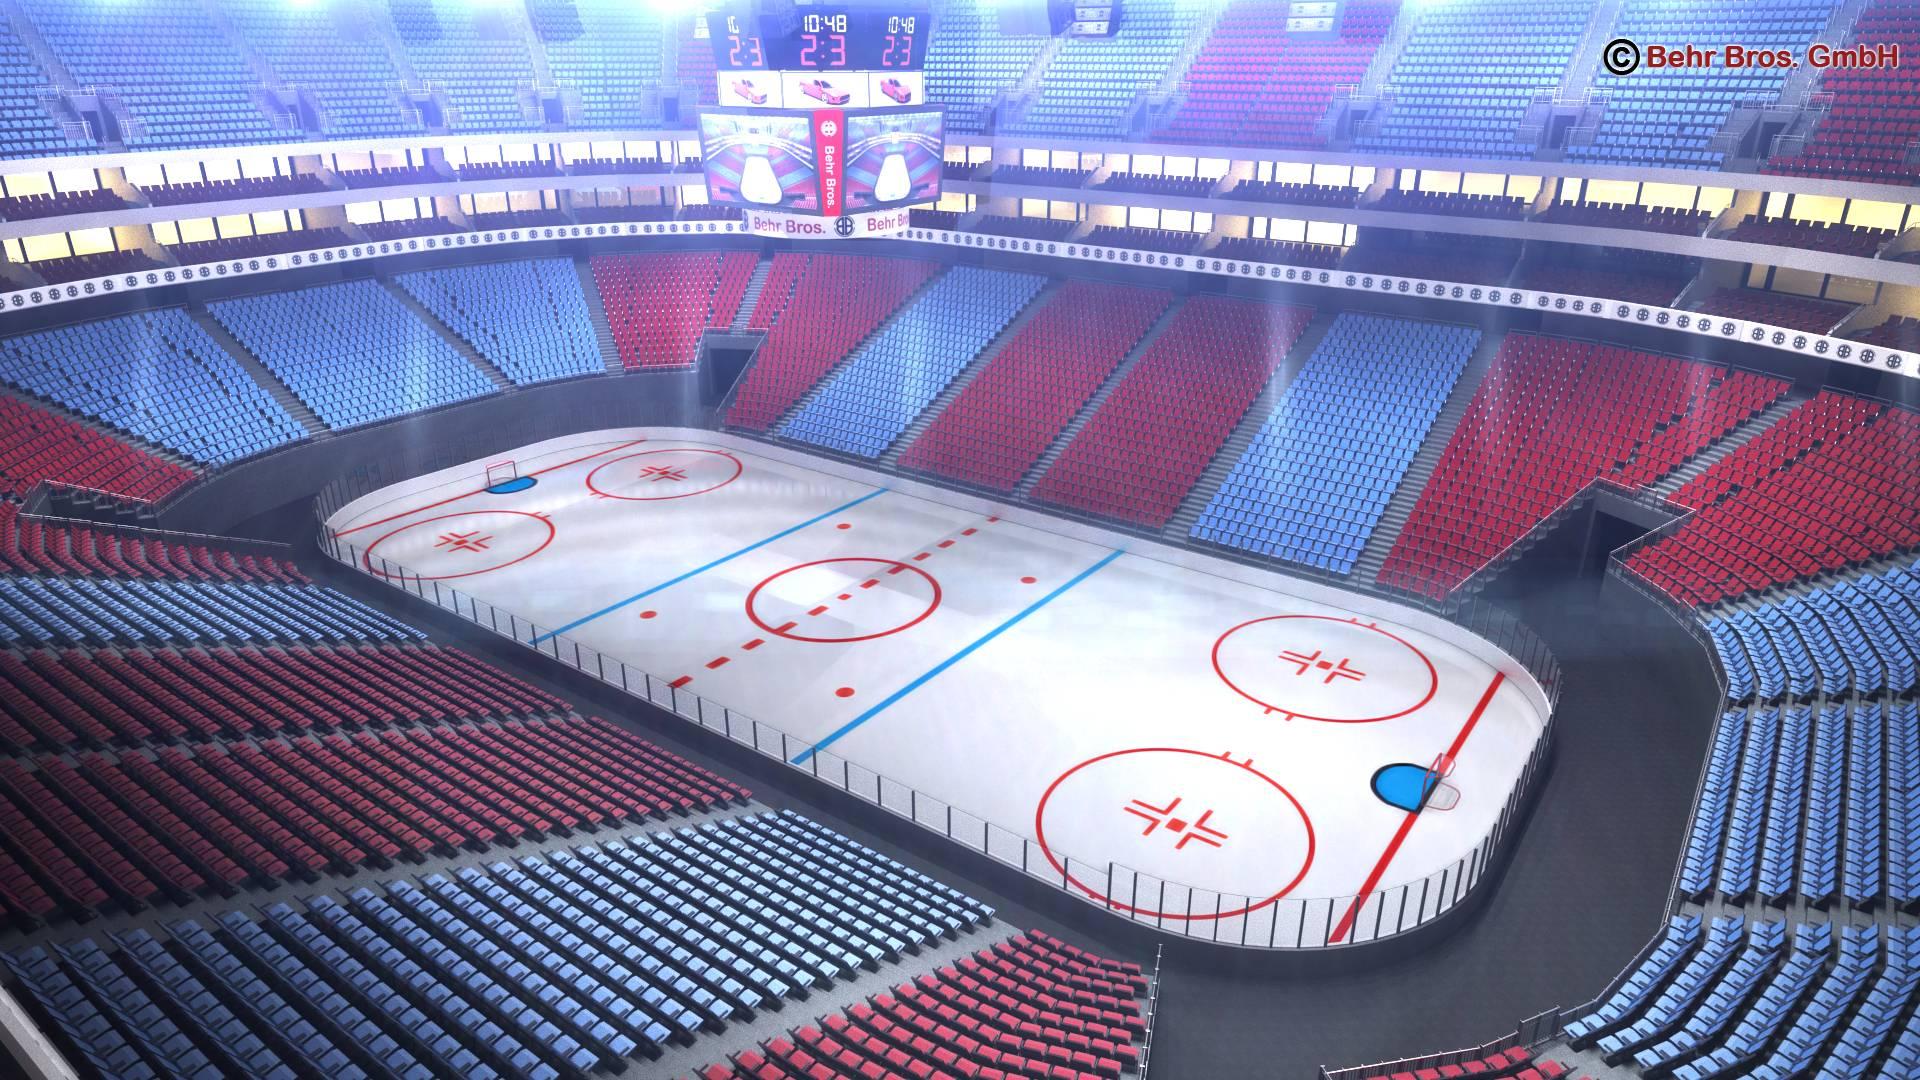 ice hockey arena v2 3d model 3ds max fbx c4d lwo ma mb obj 251653